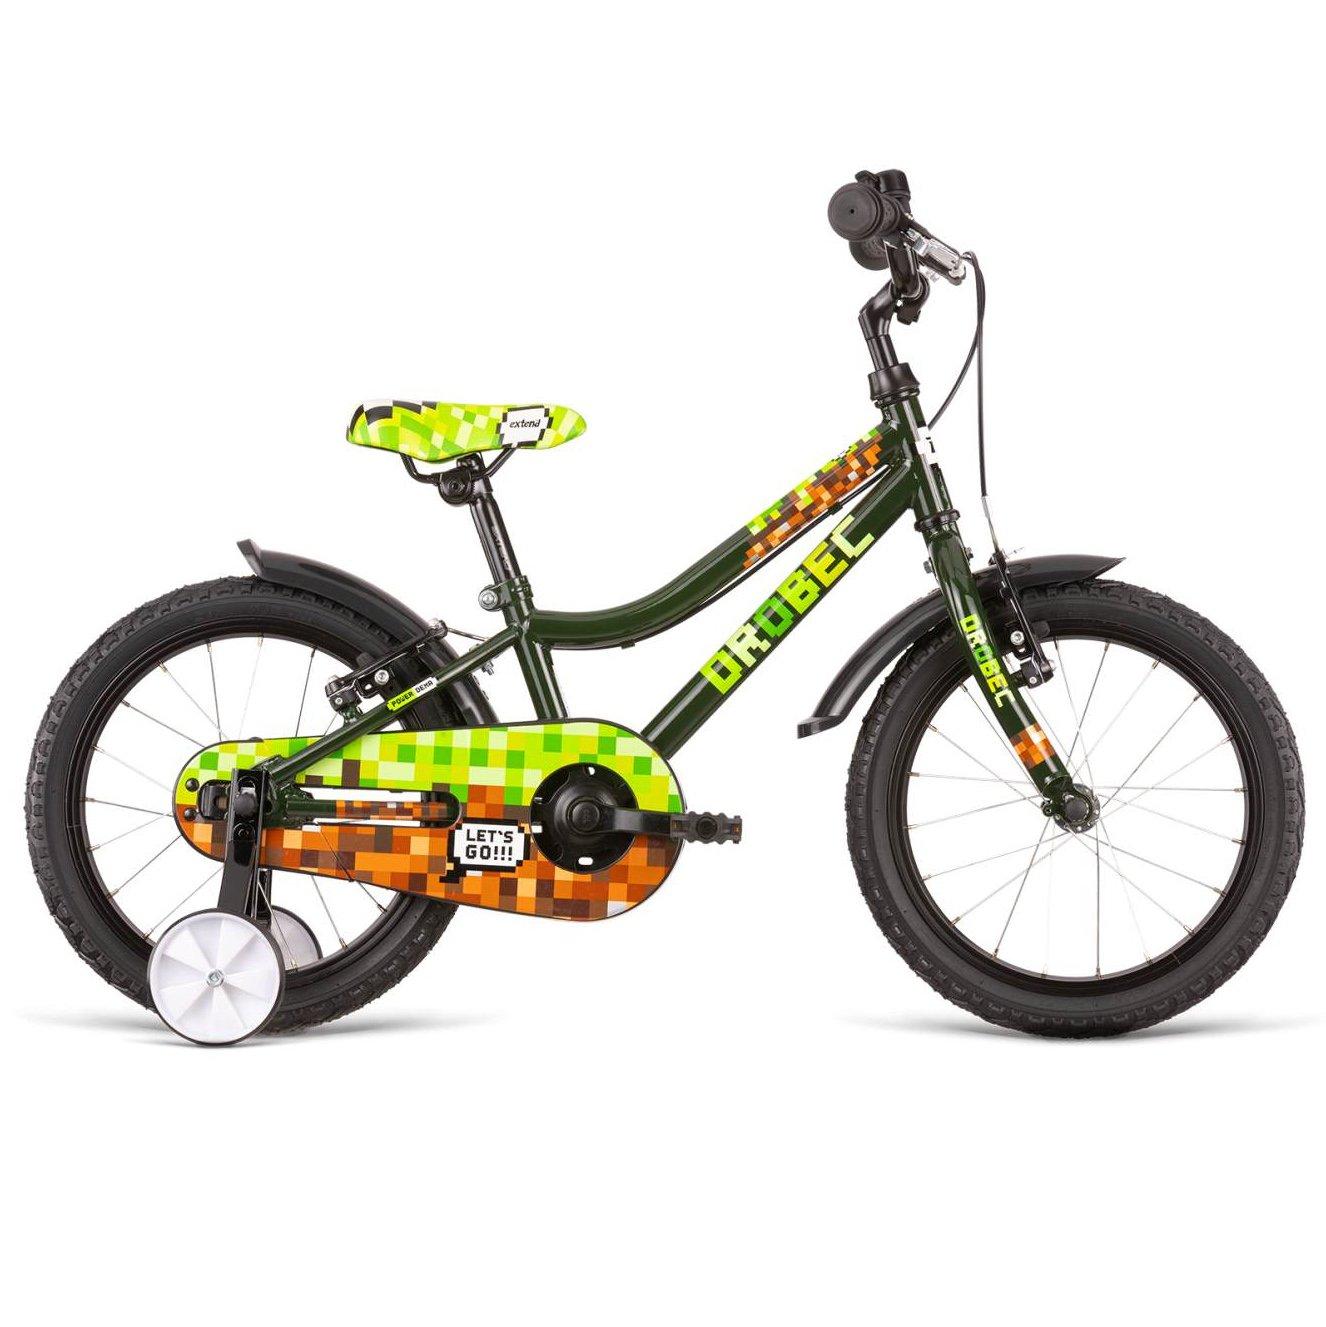 "Bērnu divritenis velosipēds Dema Drobec 16FW 16"""